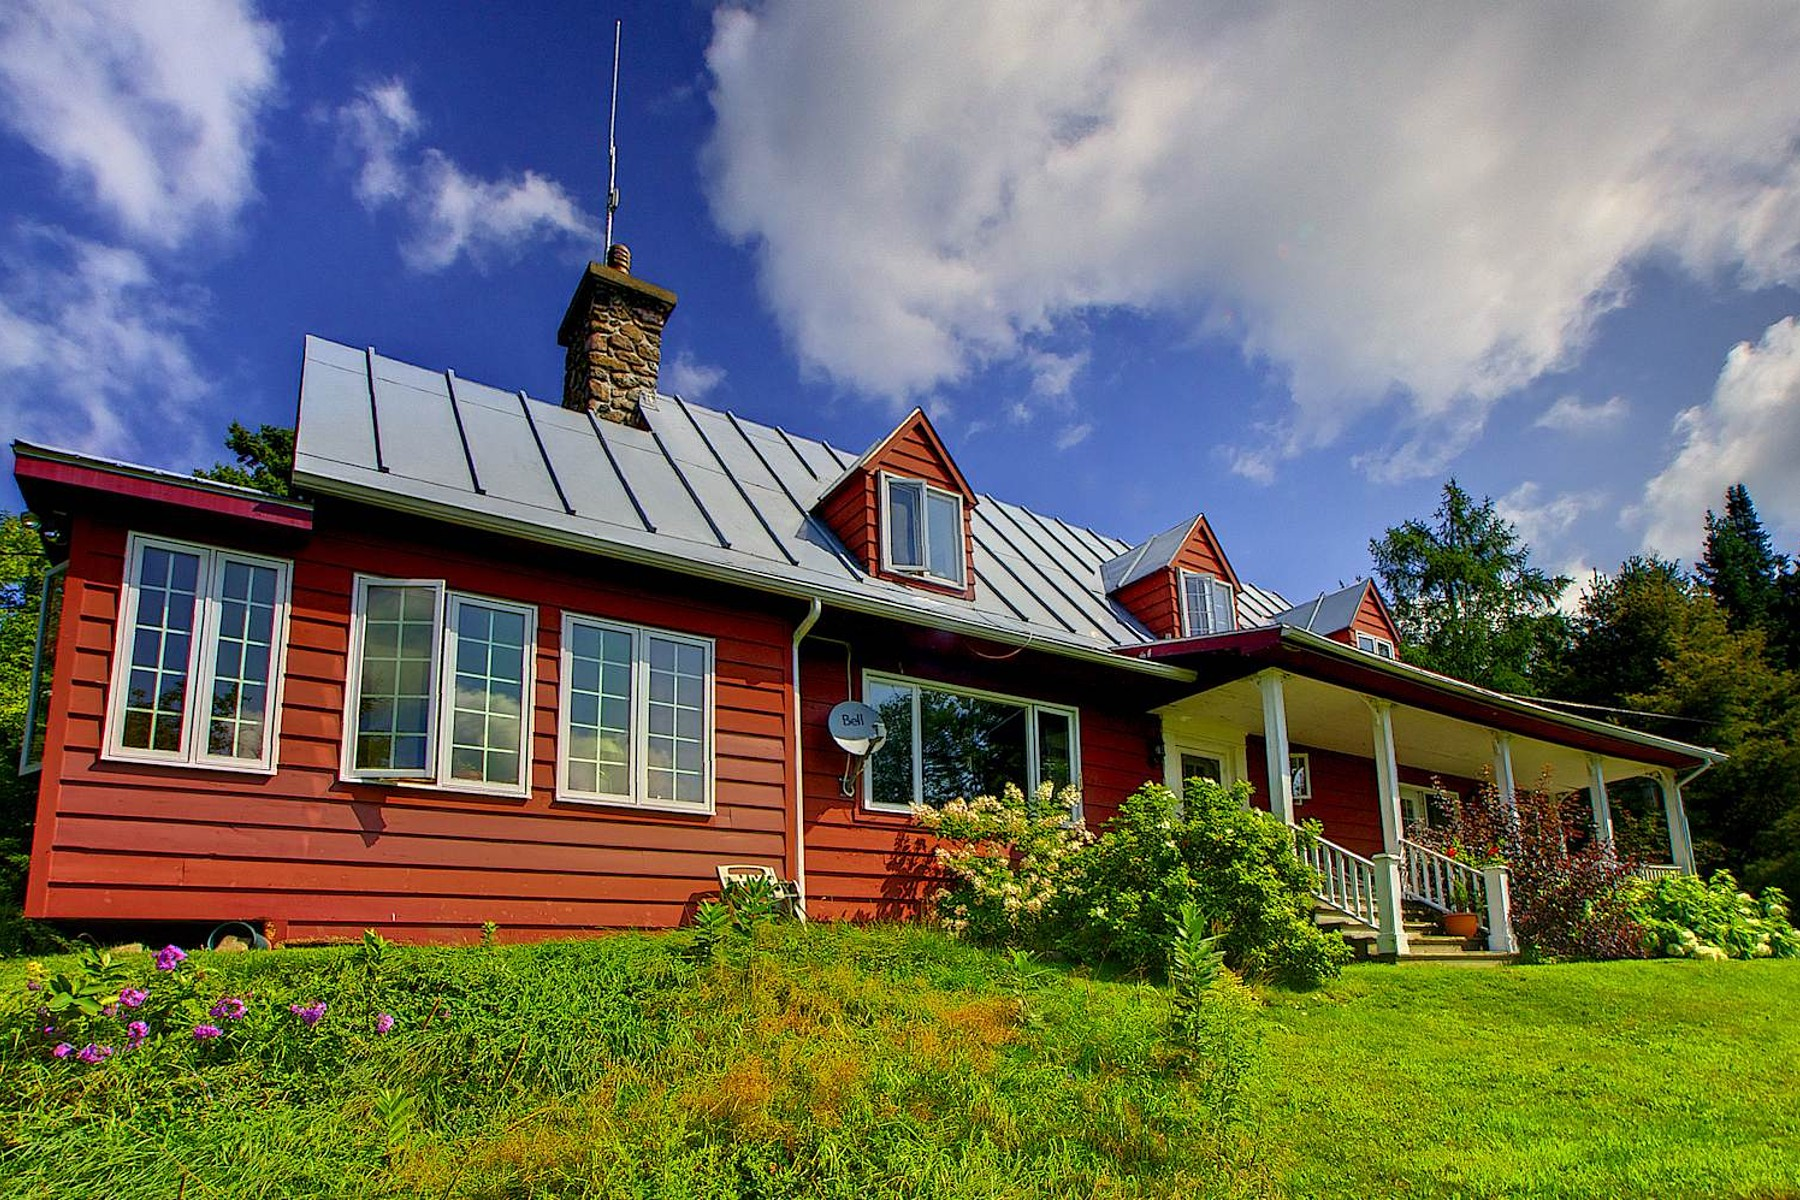 Other Residential for Sale at Sainte-Anne-des-Lacs, Laurentides 1047 Ch. de Ste-Anne-des-Lacs Sainte-Anne-Des-Lacs, Quebec J0R1B0 Canada